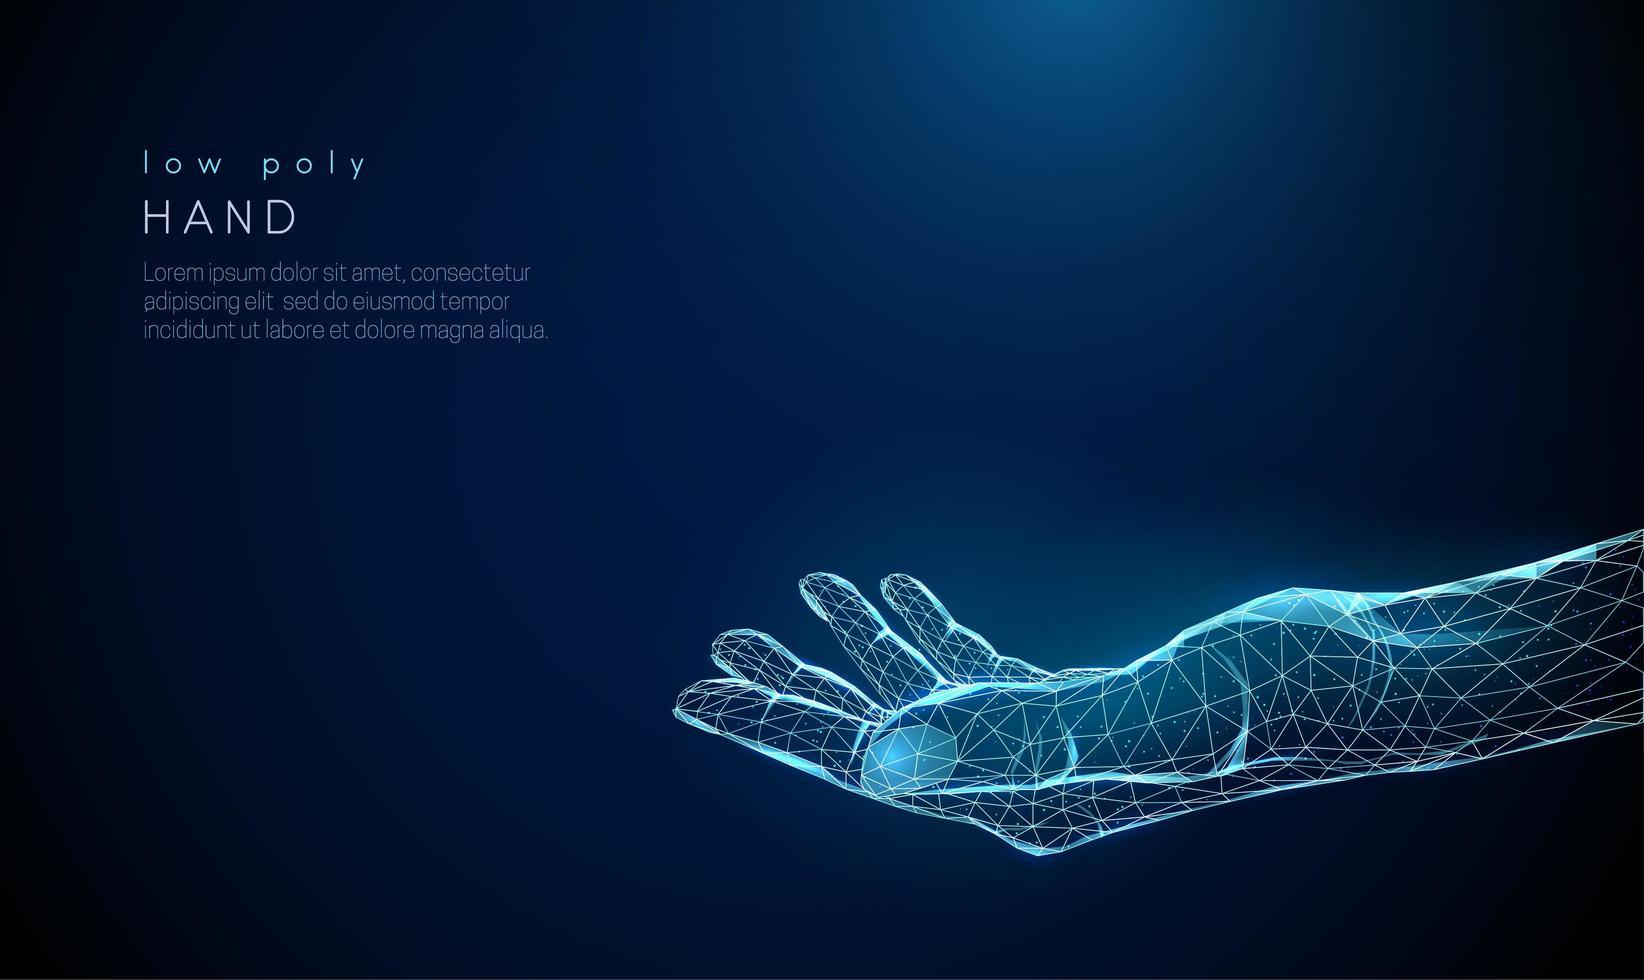 abstrakte Hand geben. Low Poly Style Design. vektor